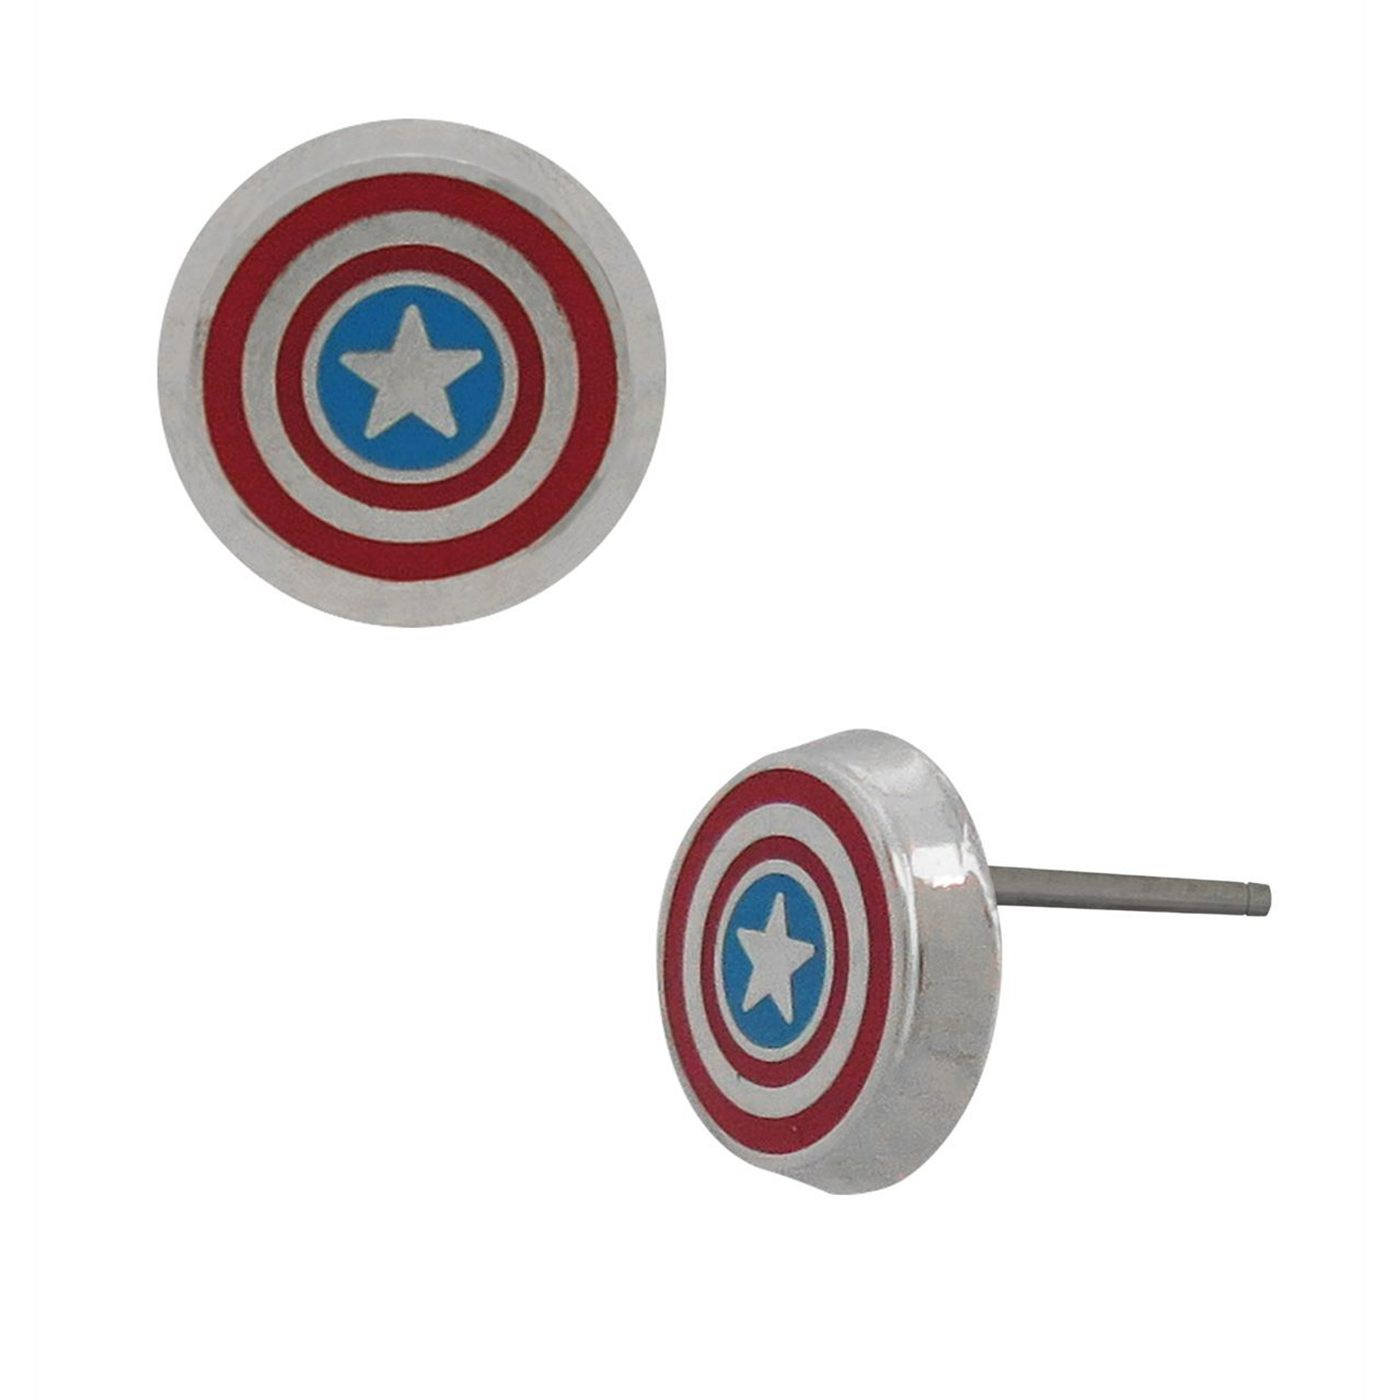 Captain America Shield Stainless Steel Stud Earrings